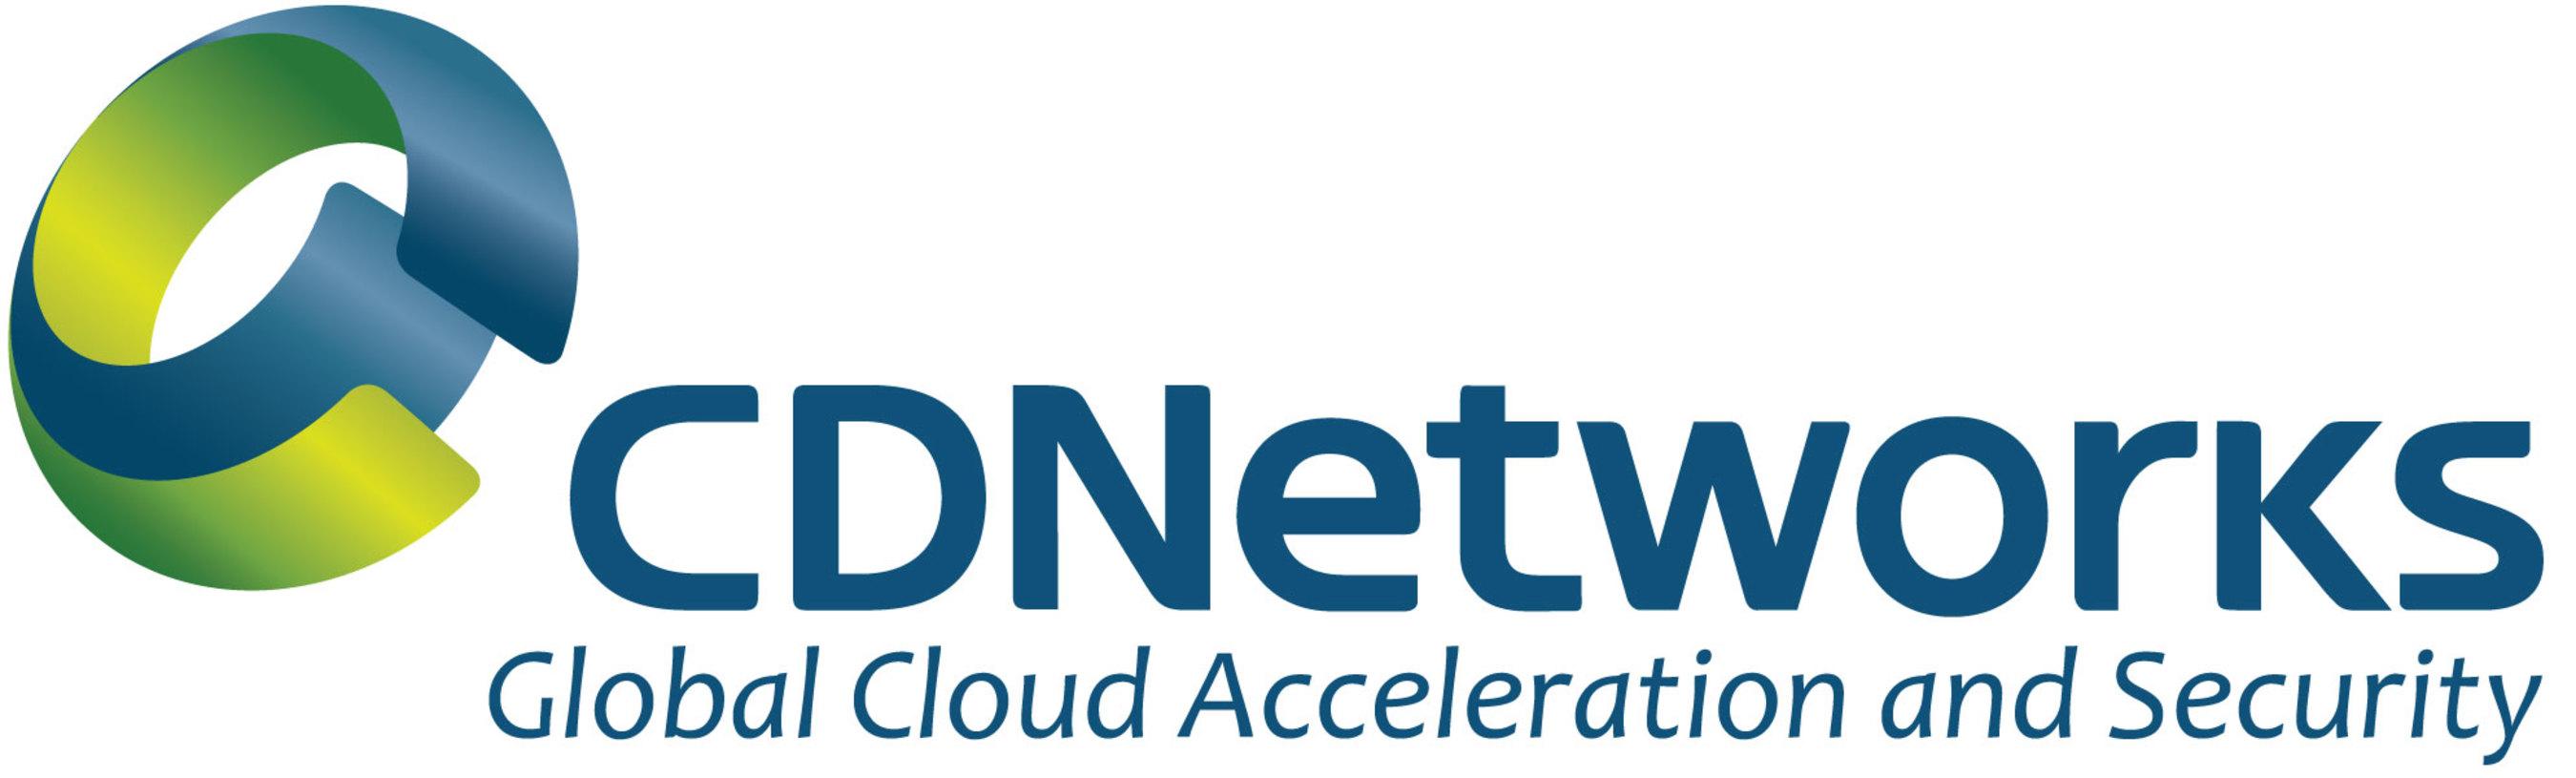 CDNetworks präsentiert Enterprise Application Security (EAS)